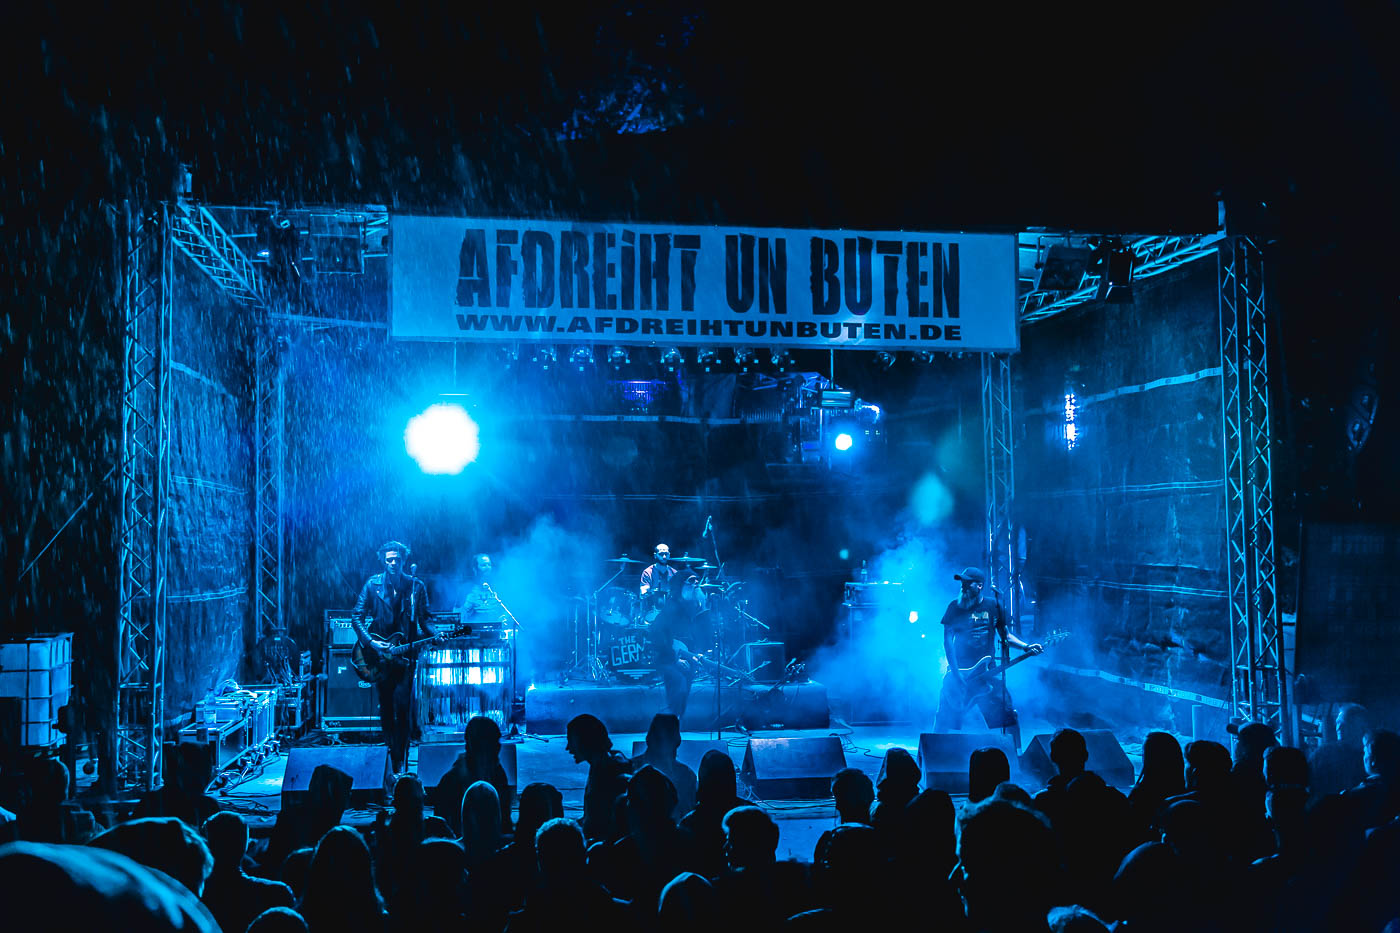 150905-AfdreihtUnButenFestival-2015-20